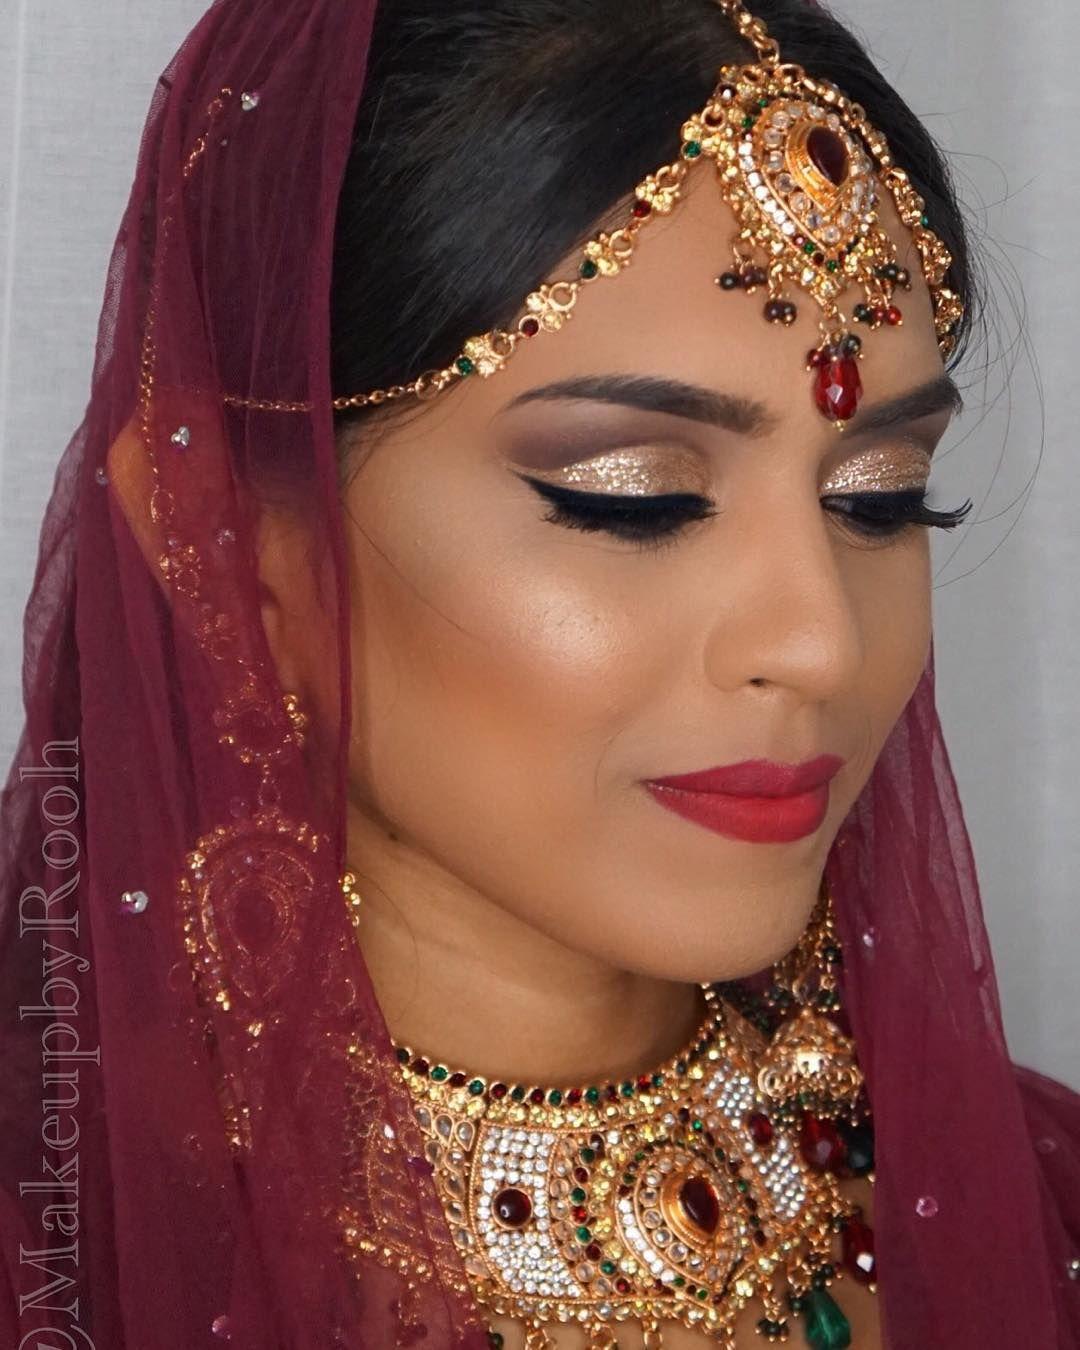 Beautiful Indian bride wearing royalvintagecouture